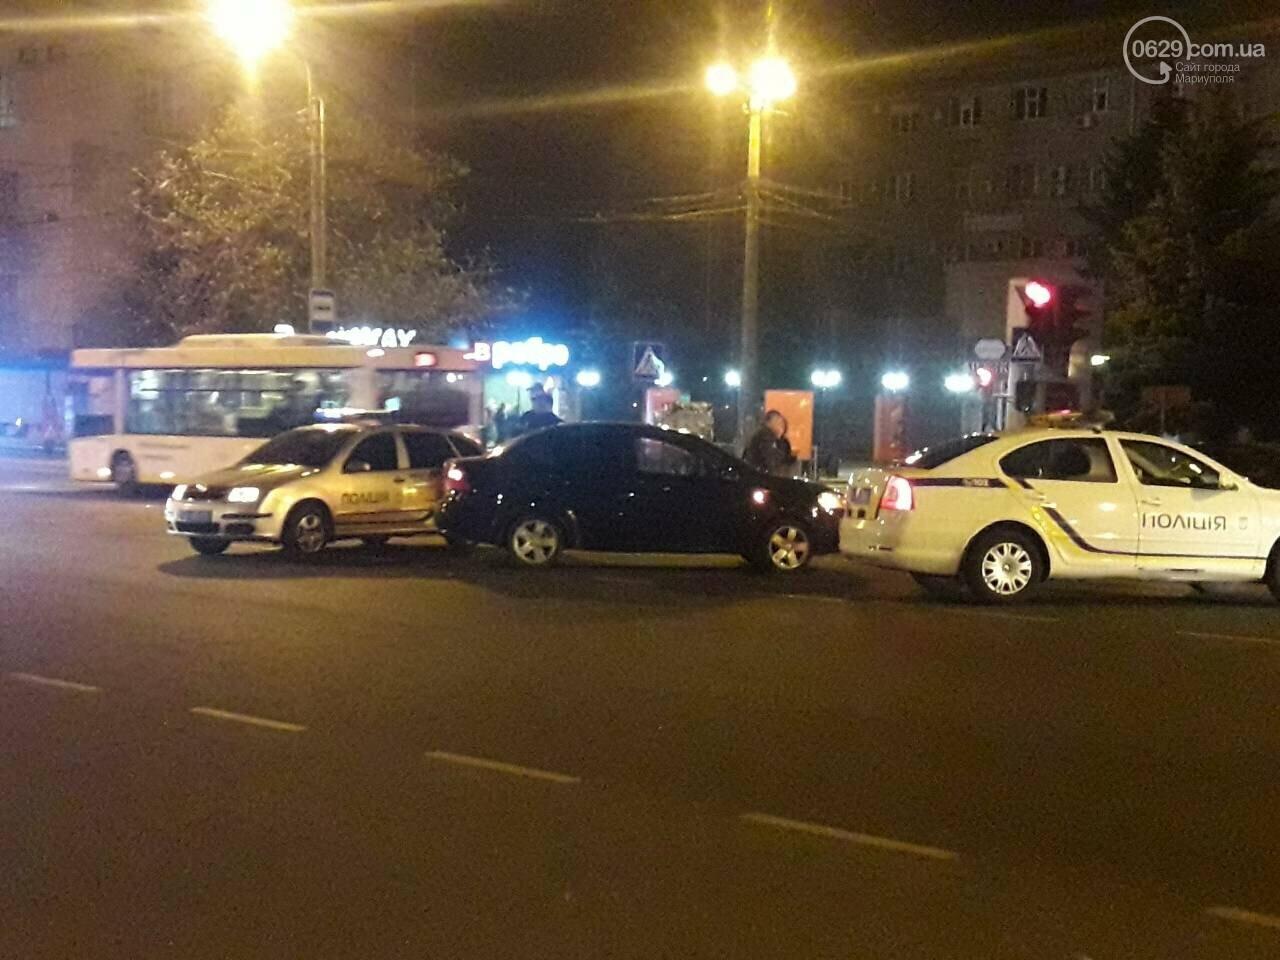 В центре Мариуполя столкнулись два автомобиля, — ФОТО, фото-6